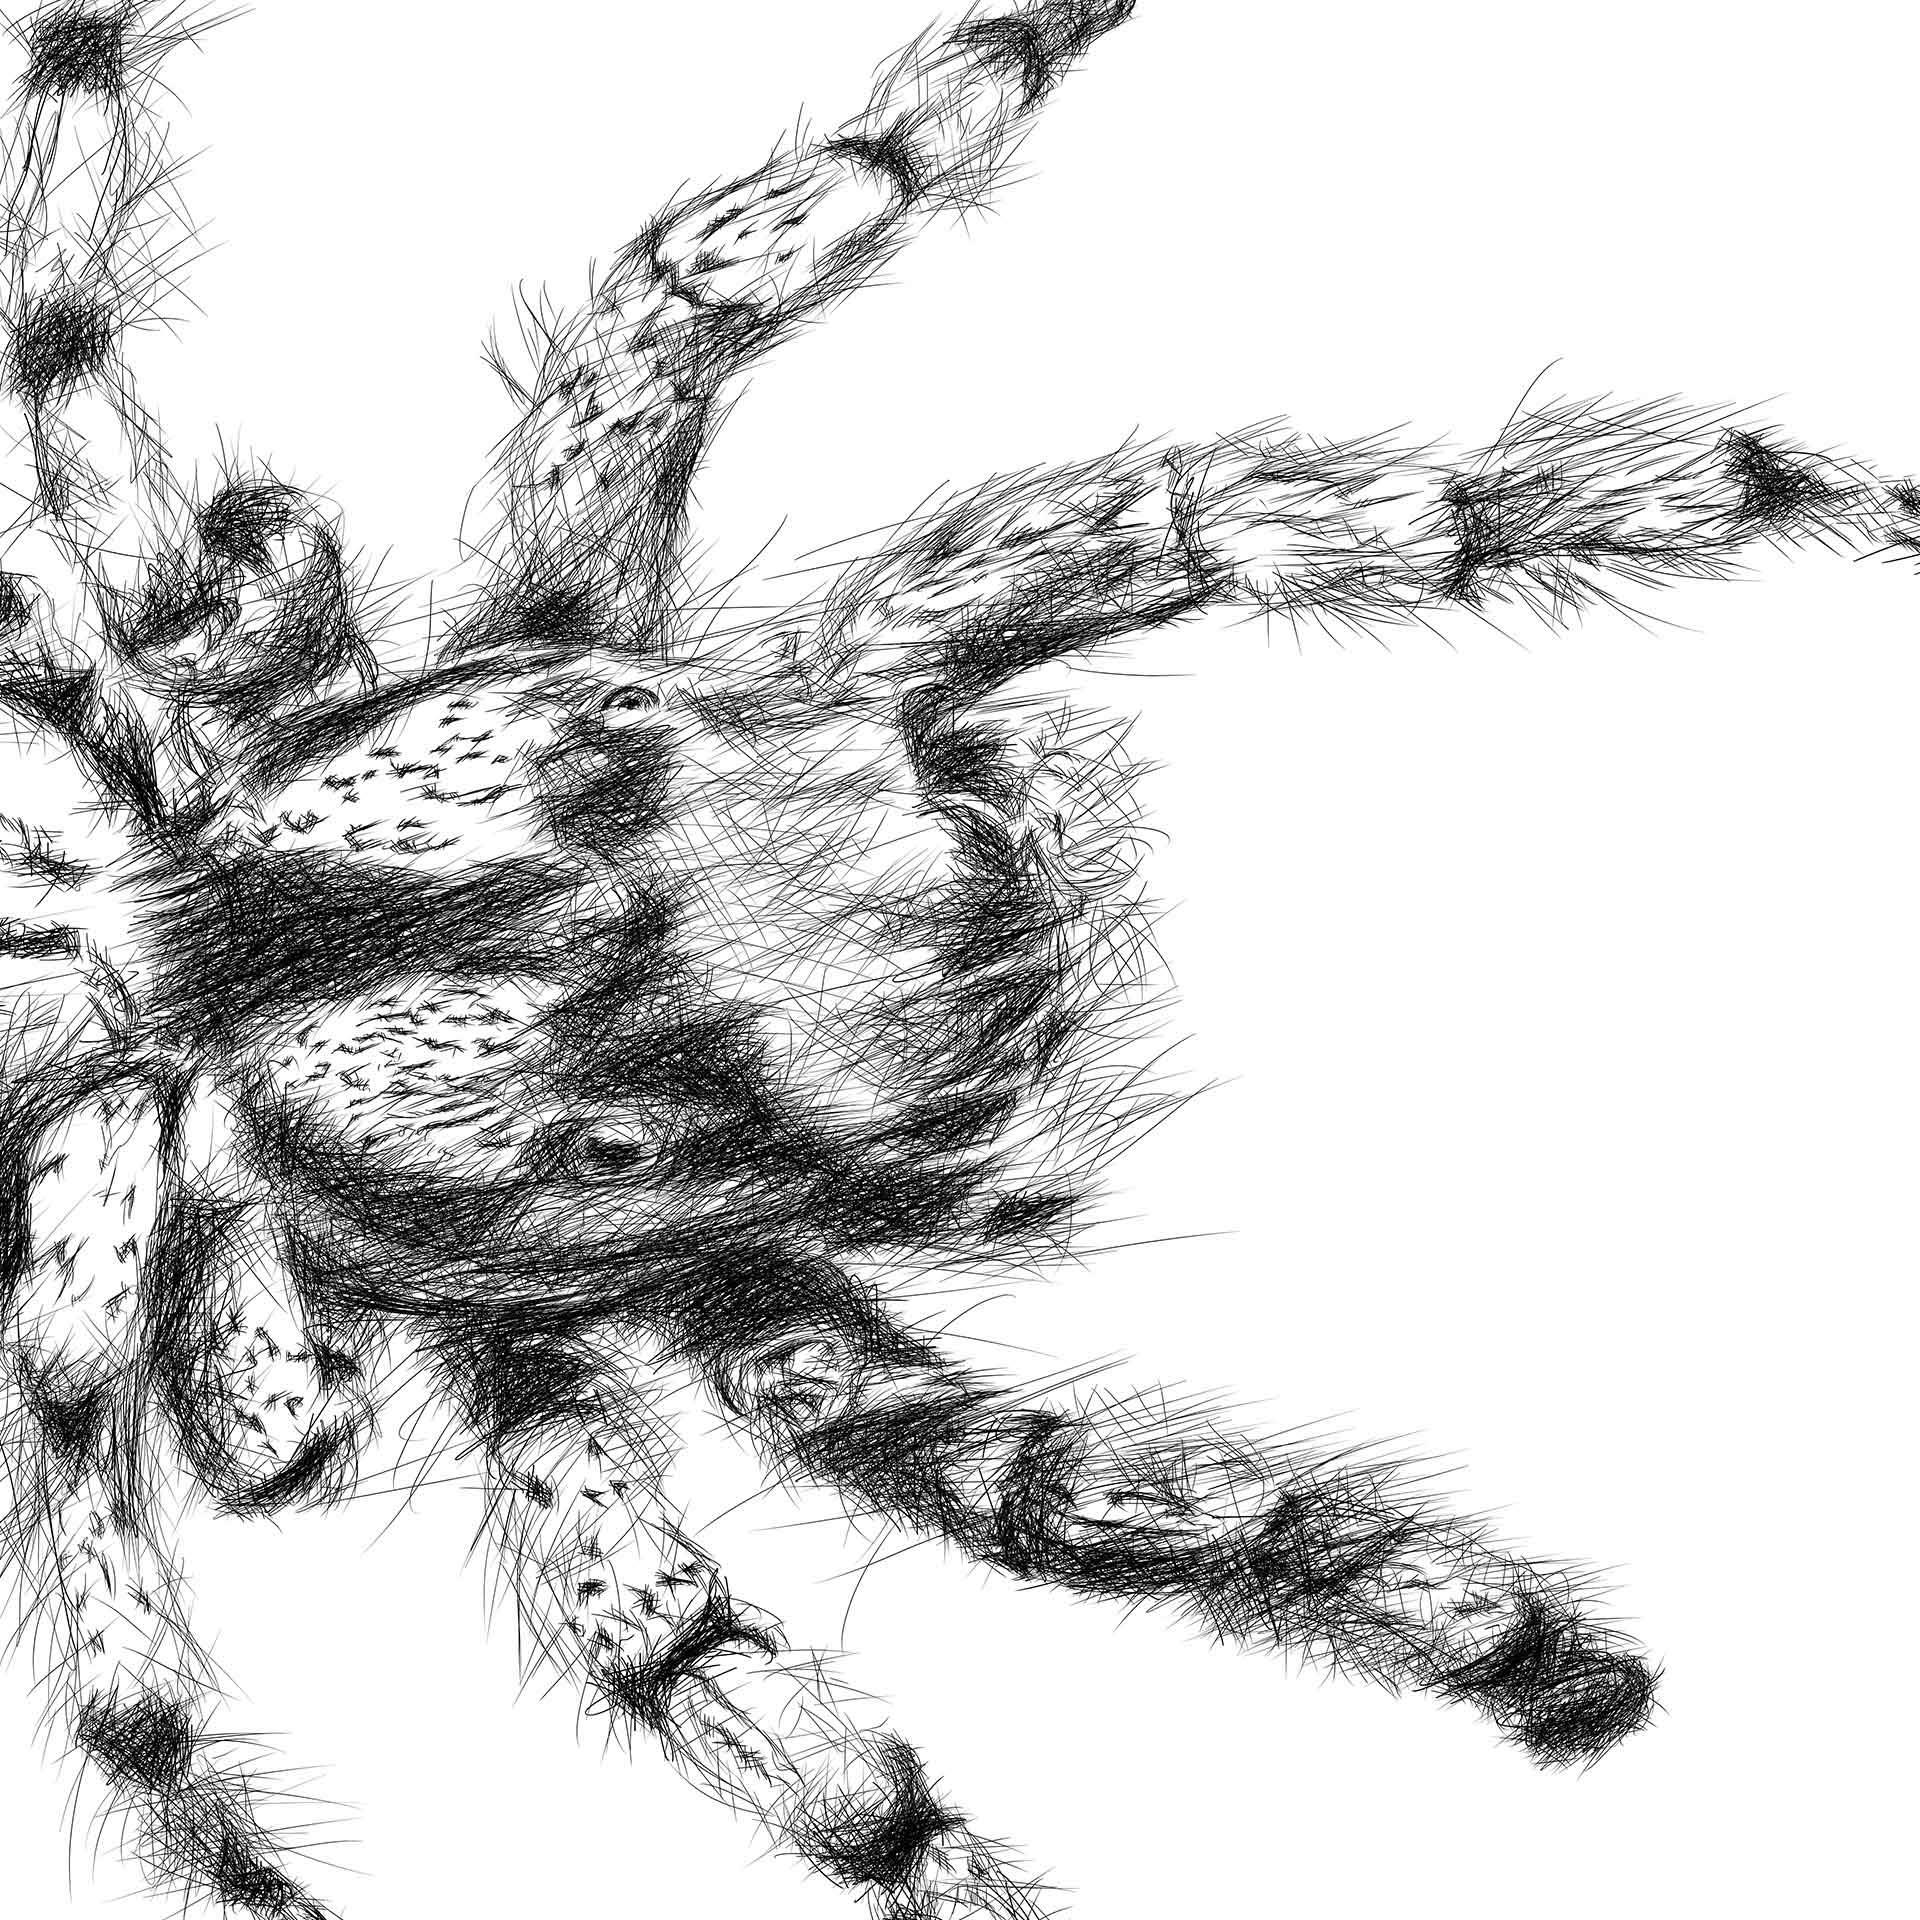 Hairy spider digital pencil line drawing ציור בעיפרון דיגיטלי עכביש closeup1